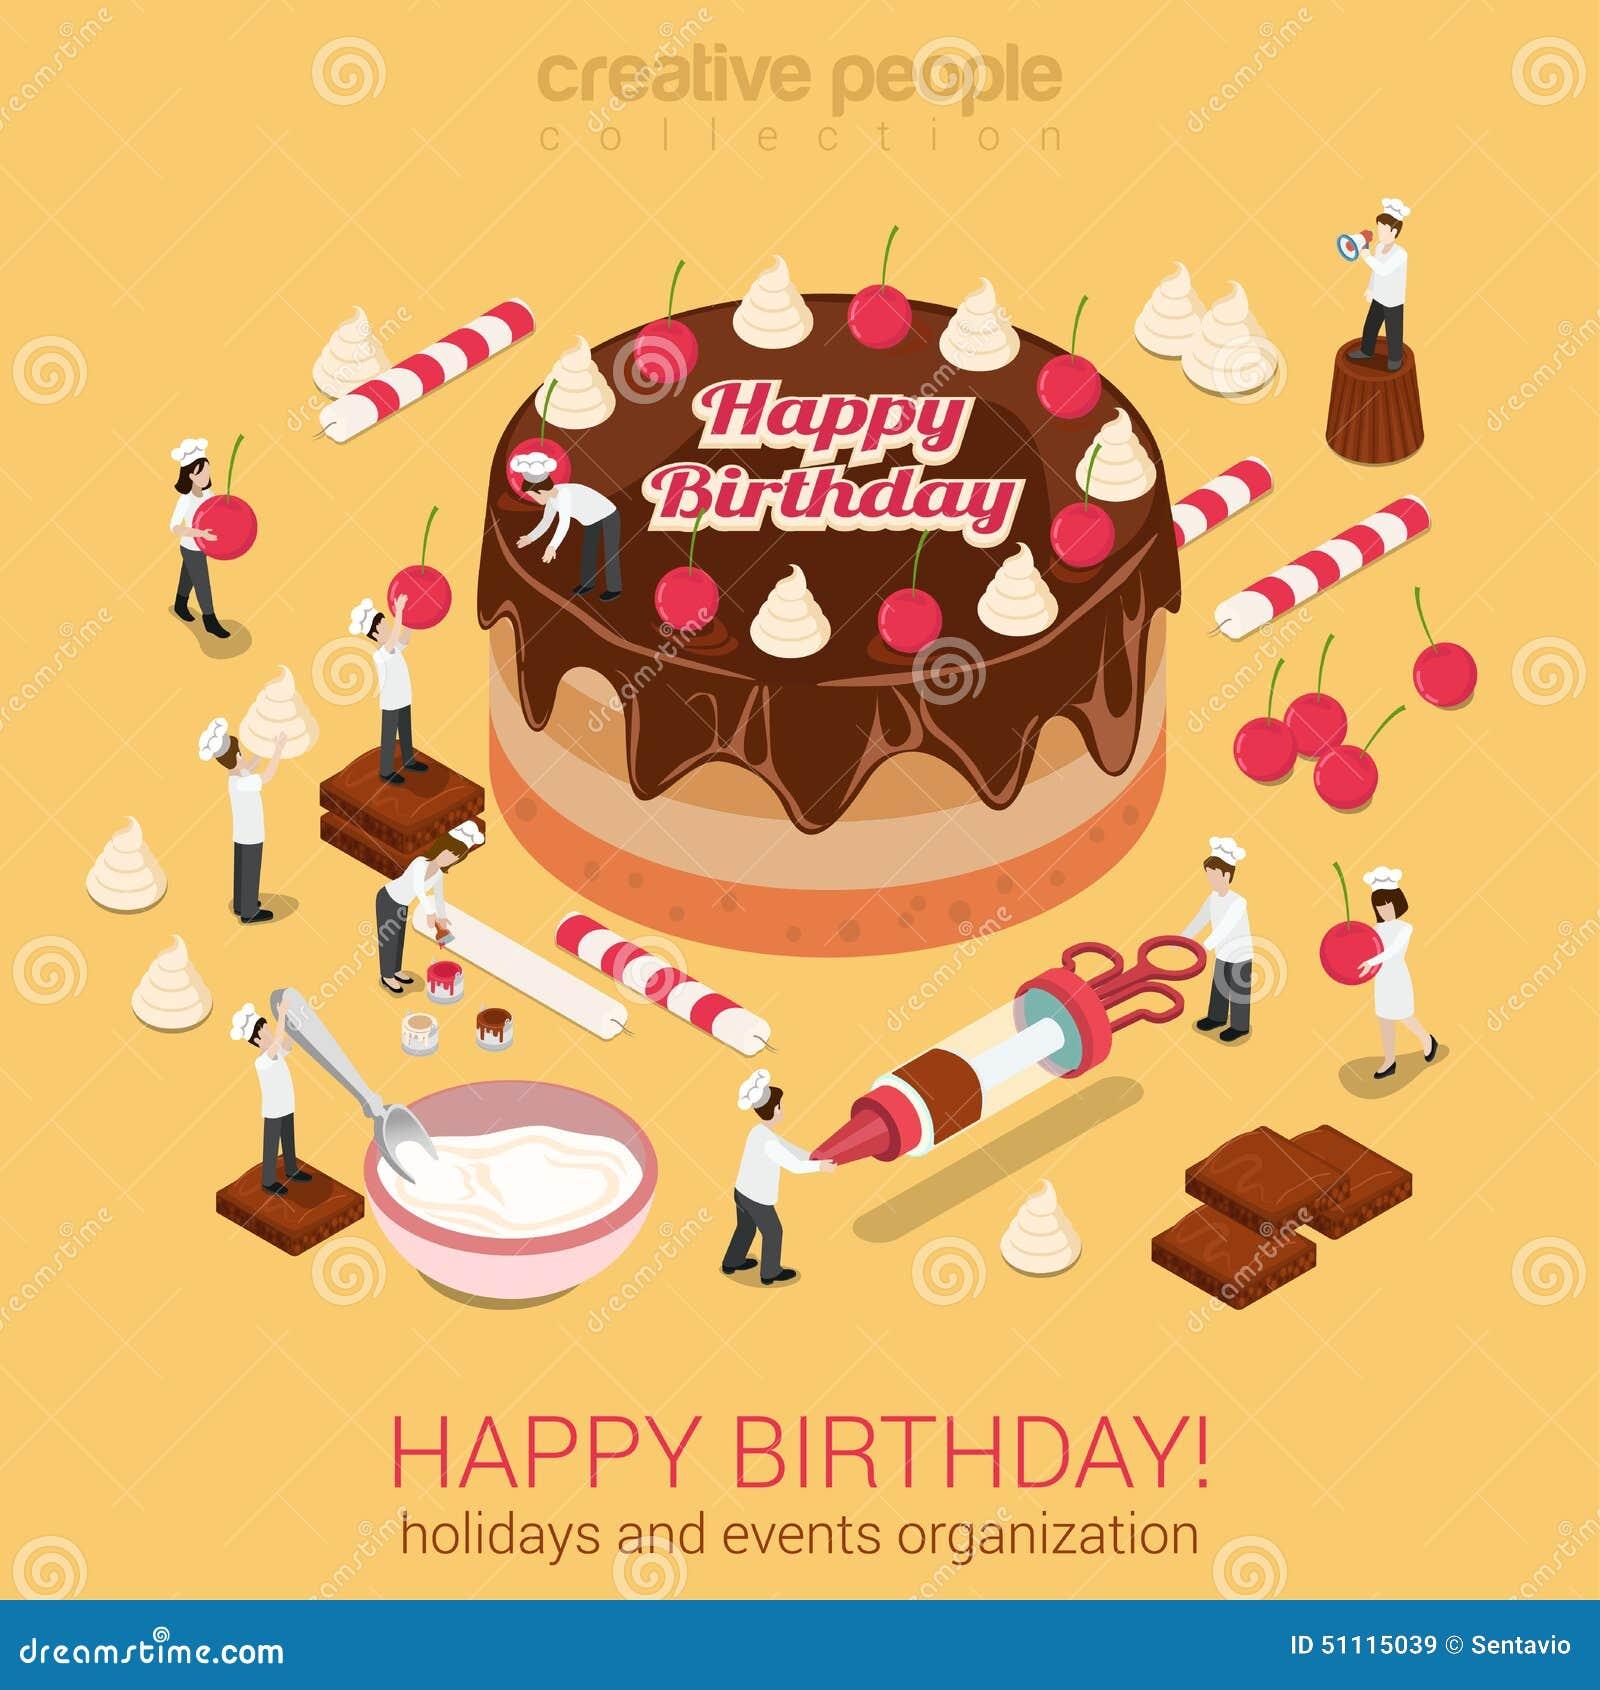 happy birthday cake with tools on cake birthday banner